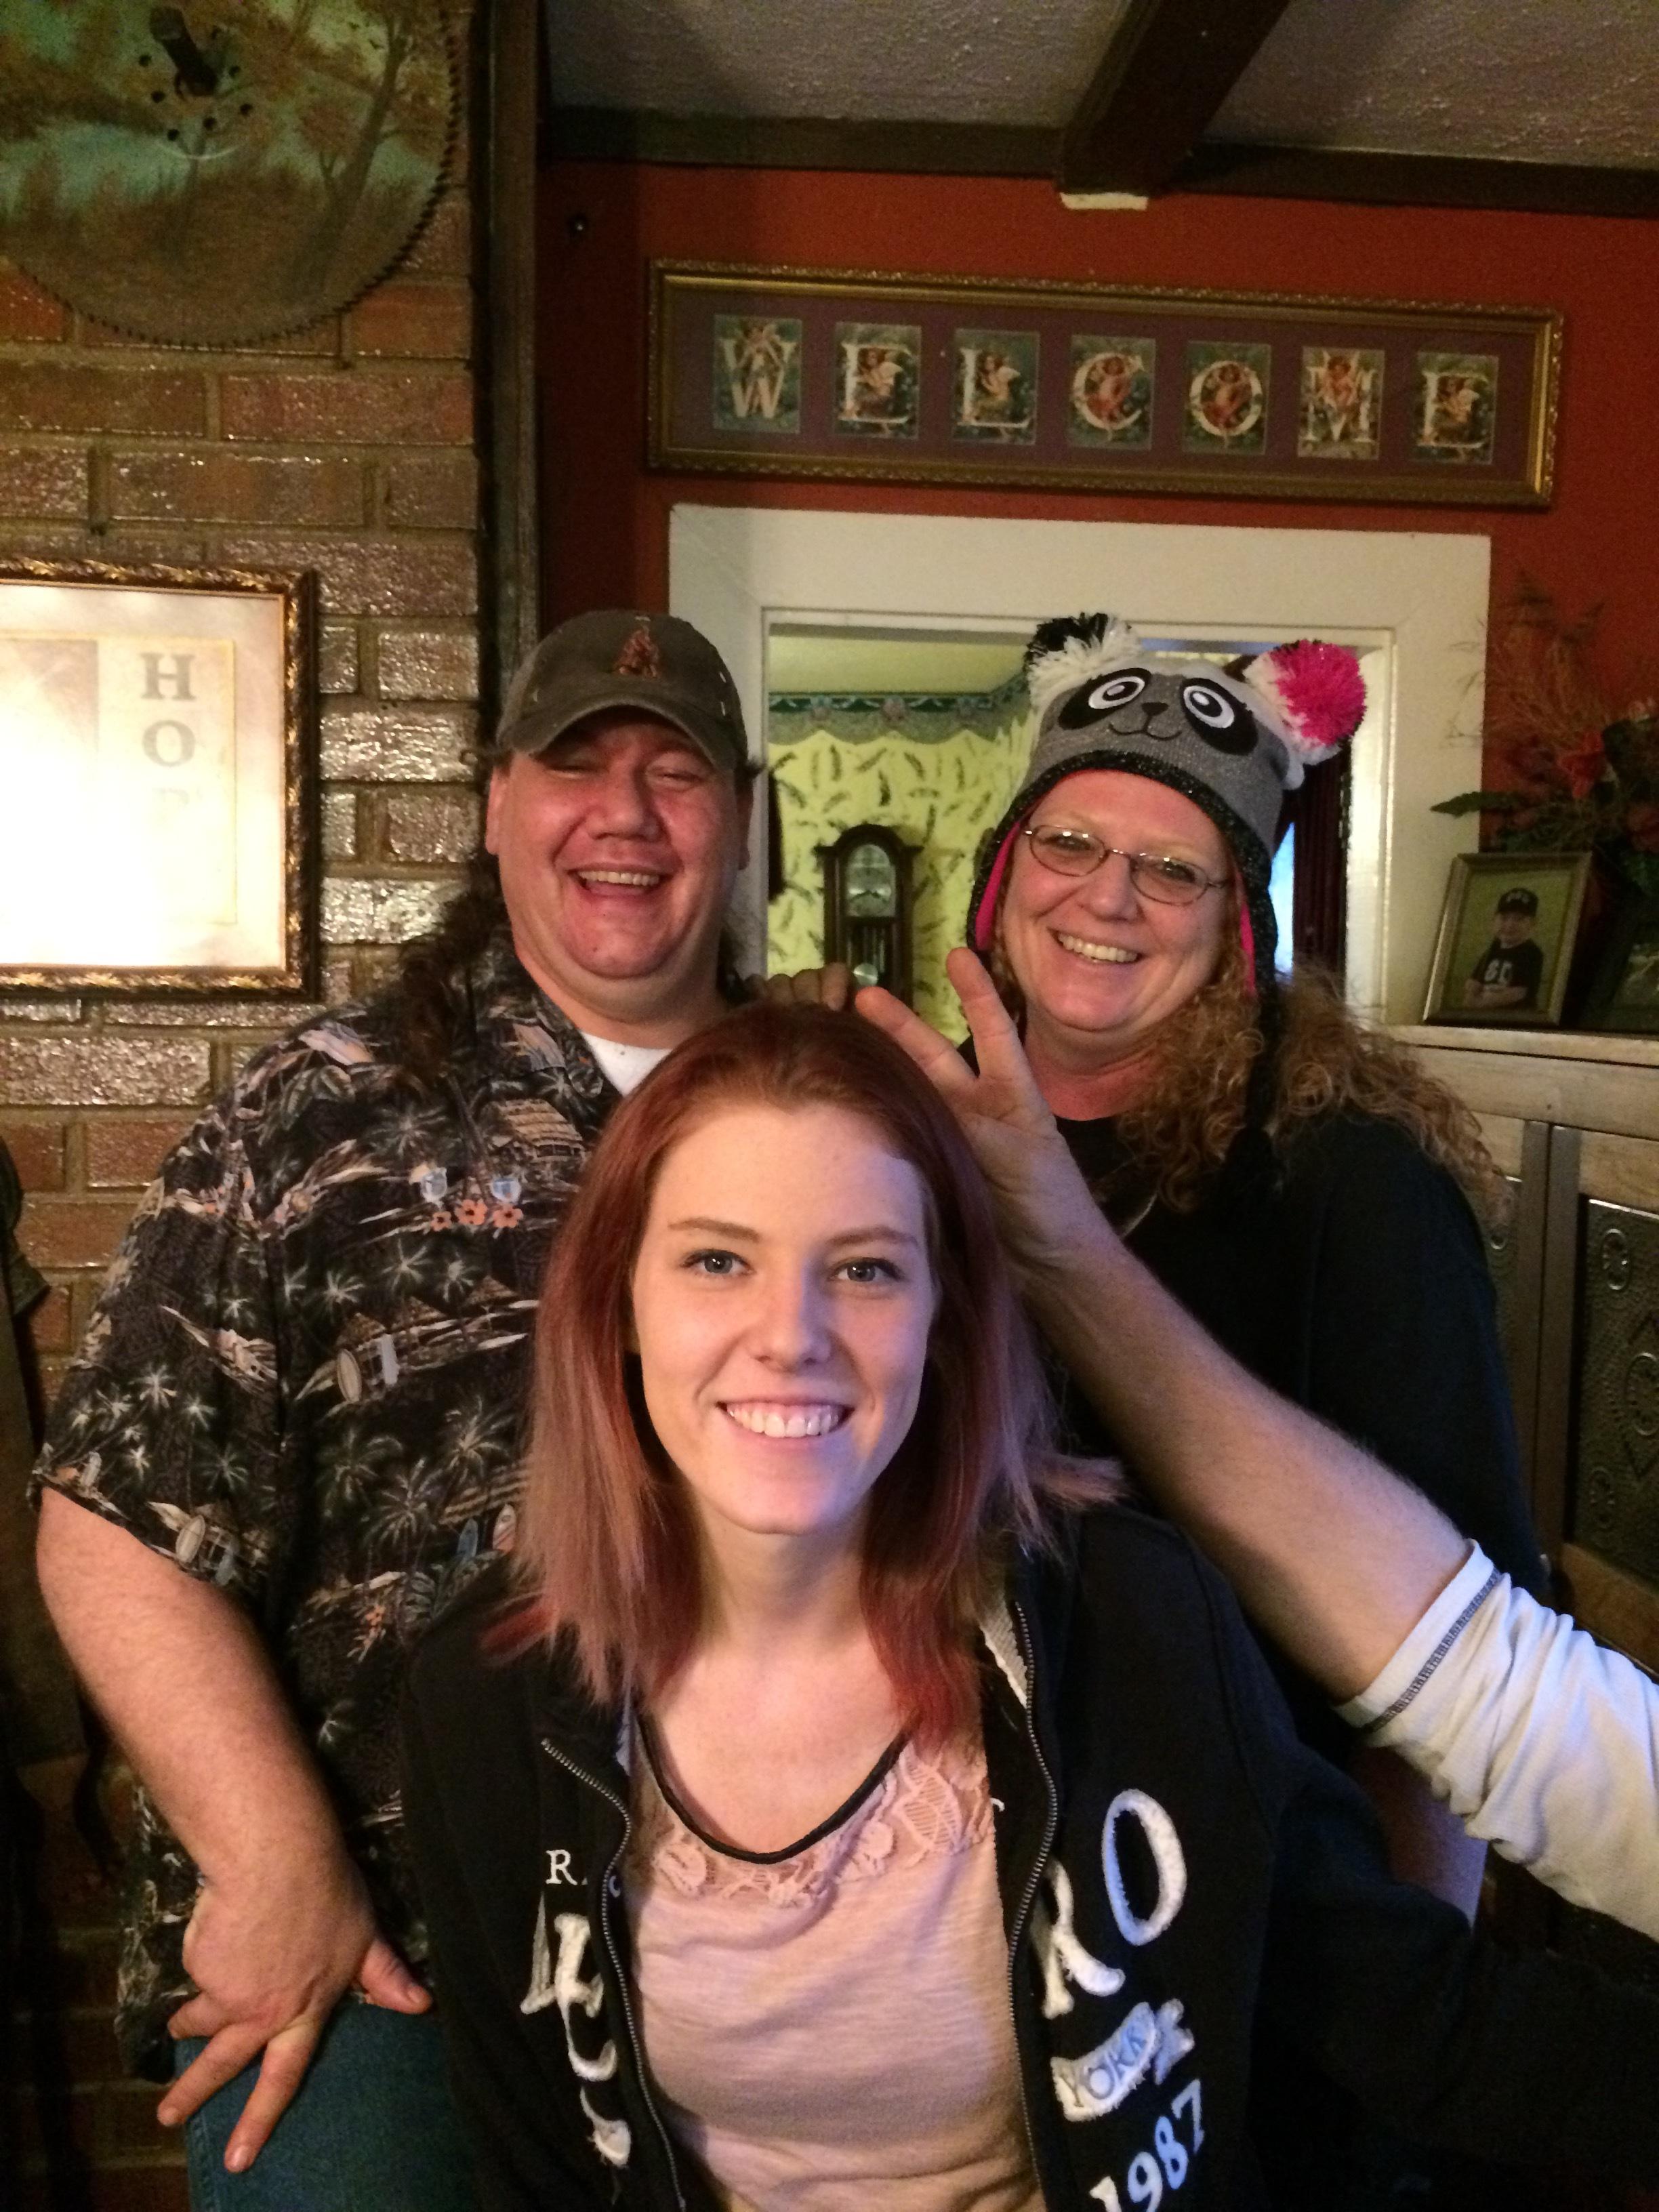 James, Michelle and Cheyenne